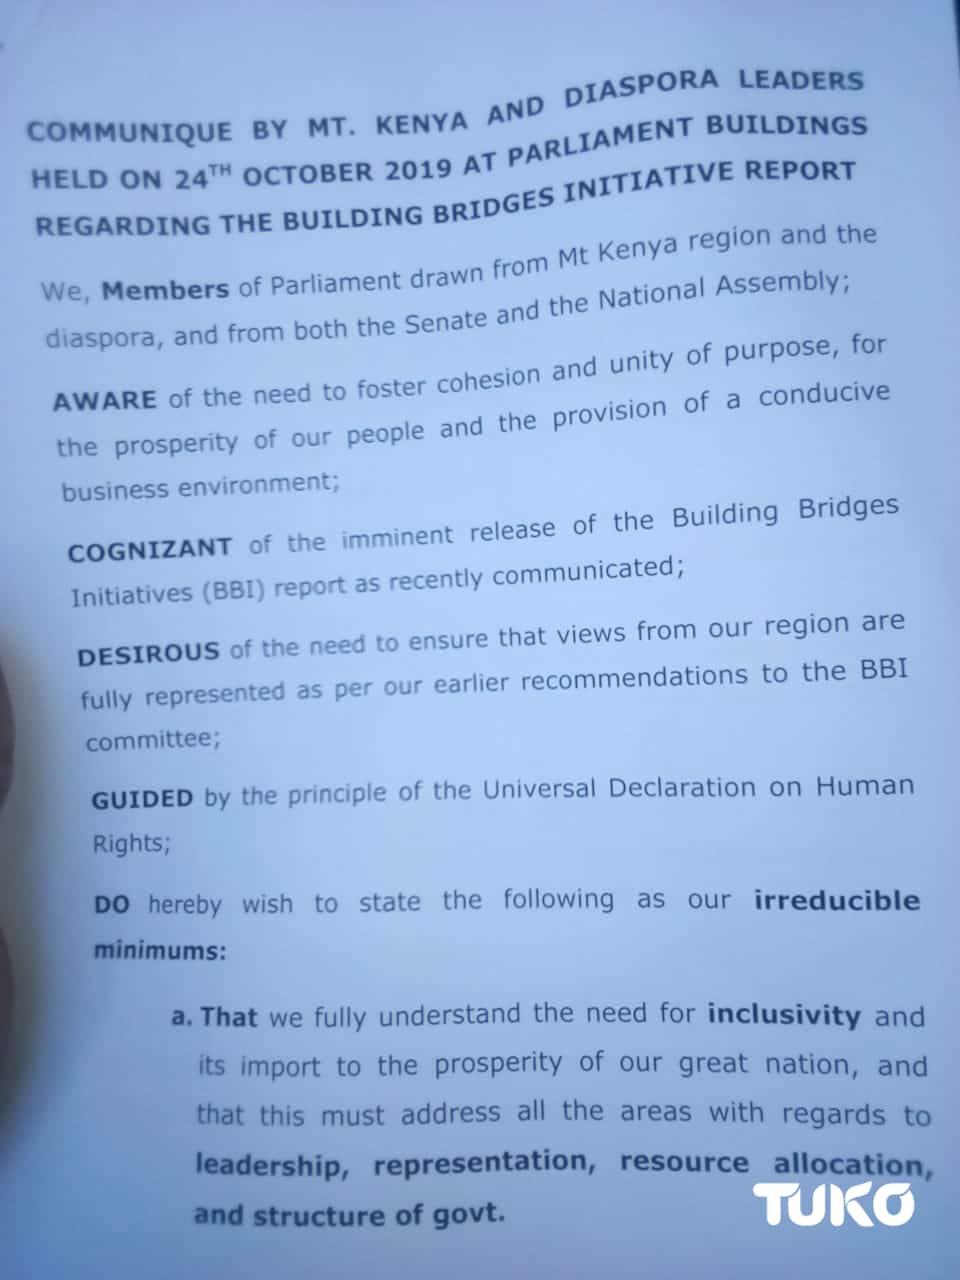 Mutahi Ngunyi says Mt. Kenya MPs are exchanging ignorance on BBI report